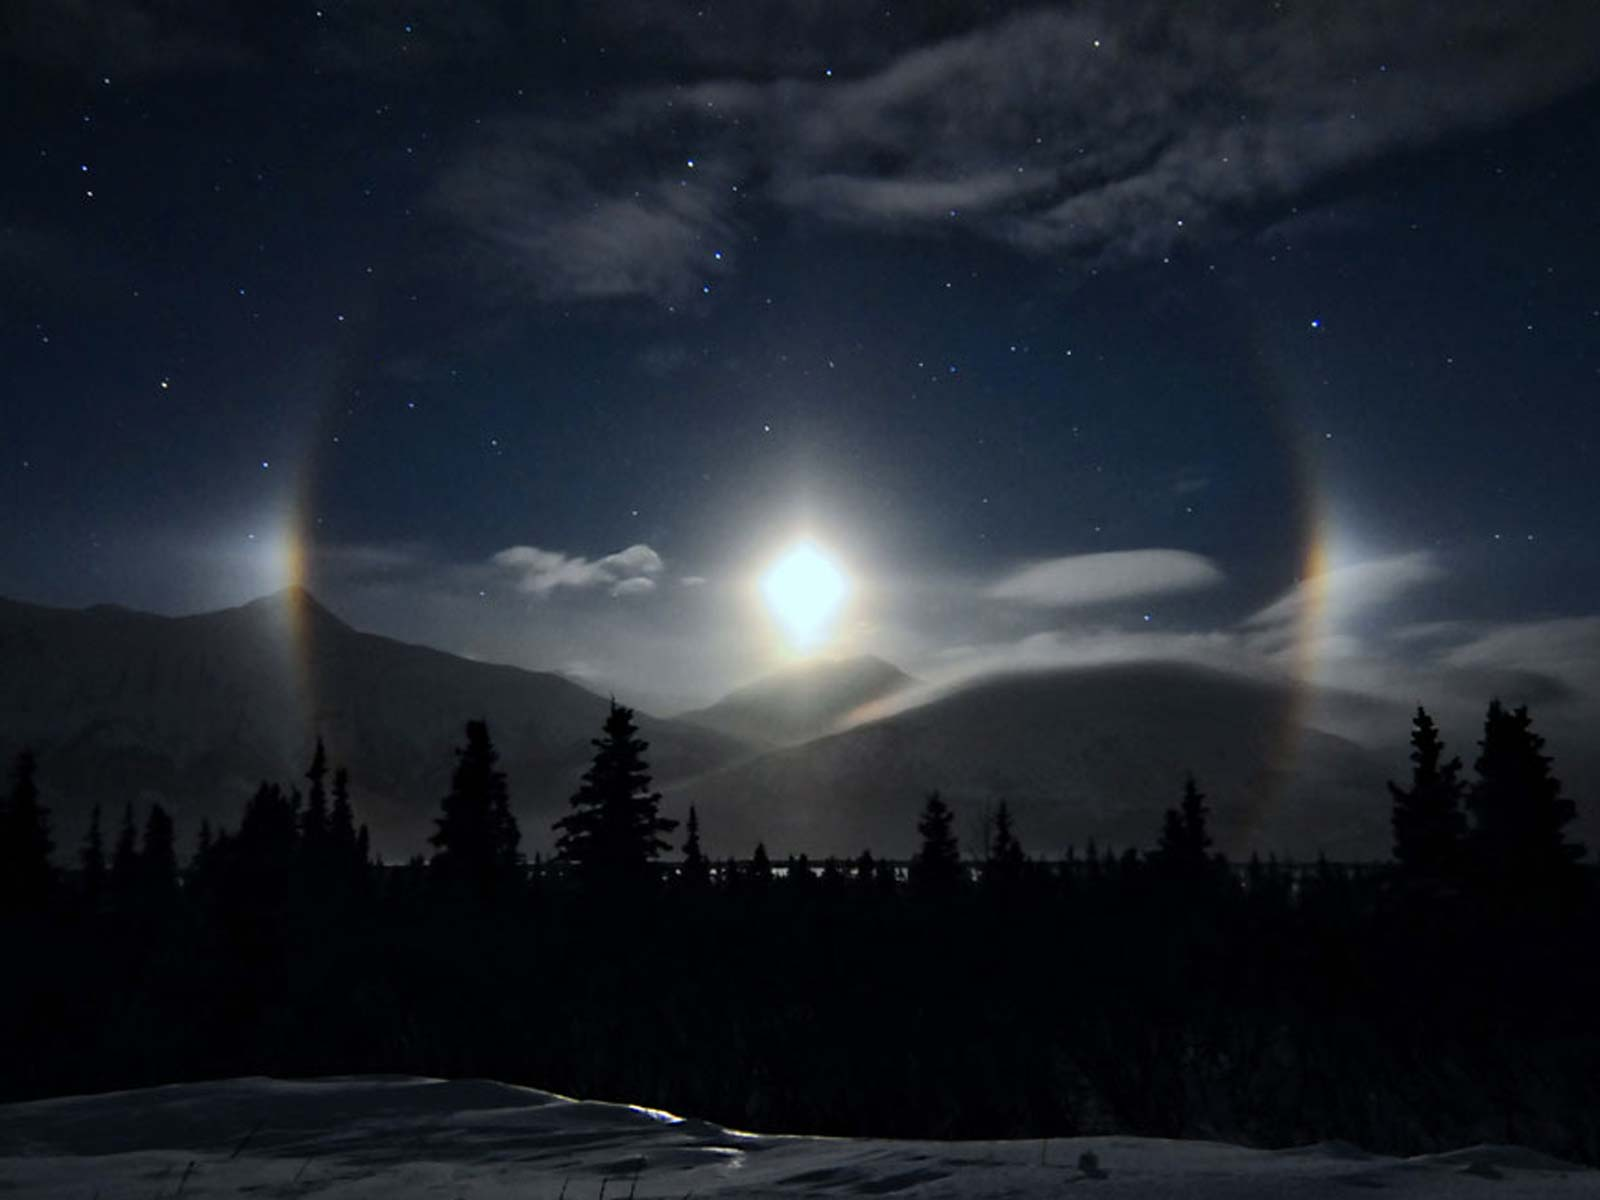 Moondogs Grace the Alaskan Sky   Space Wallpaper